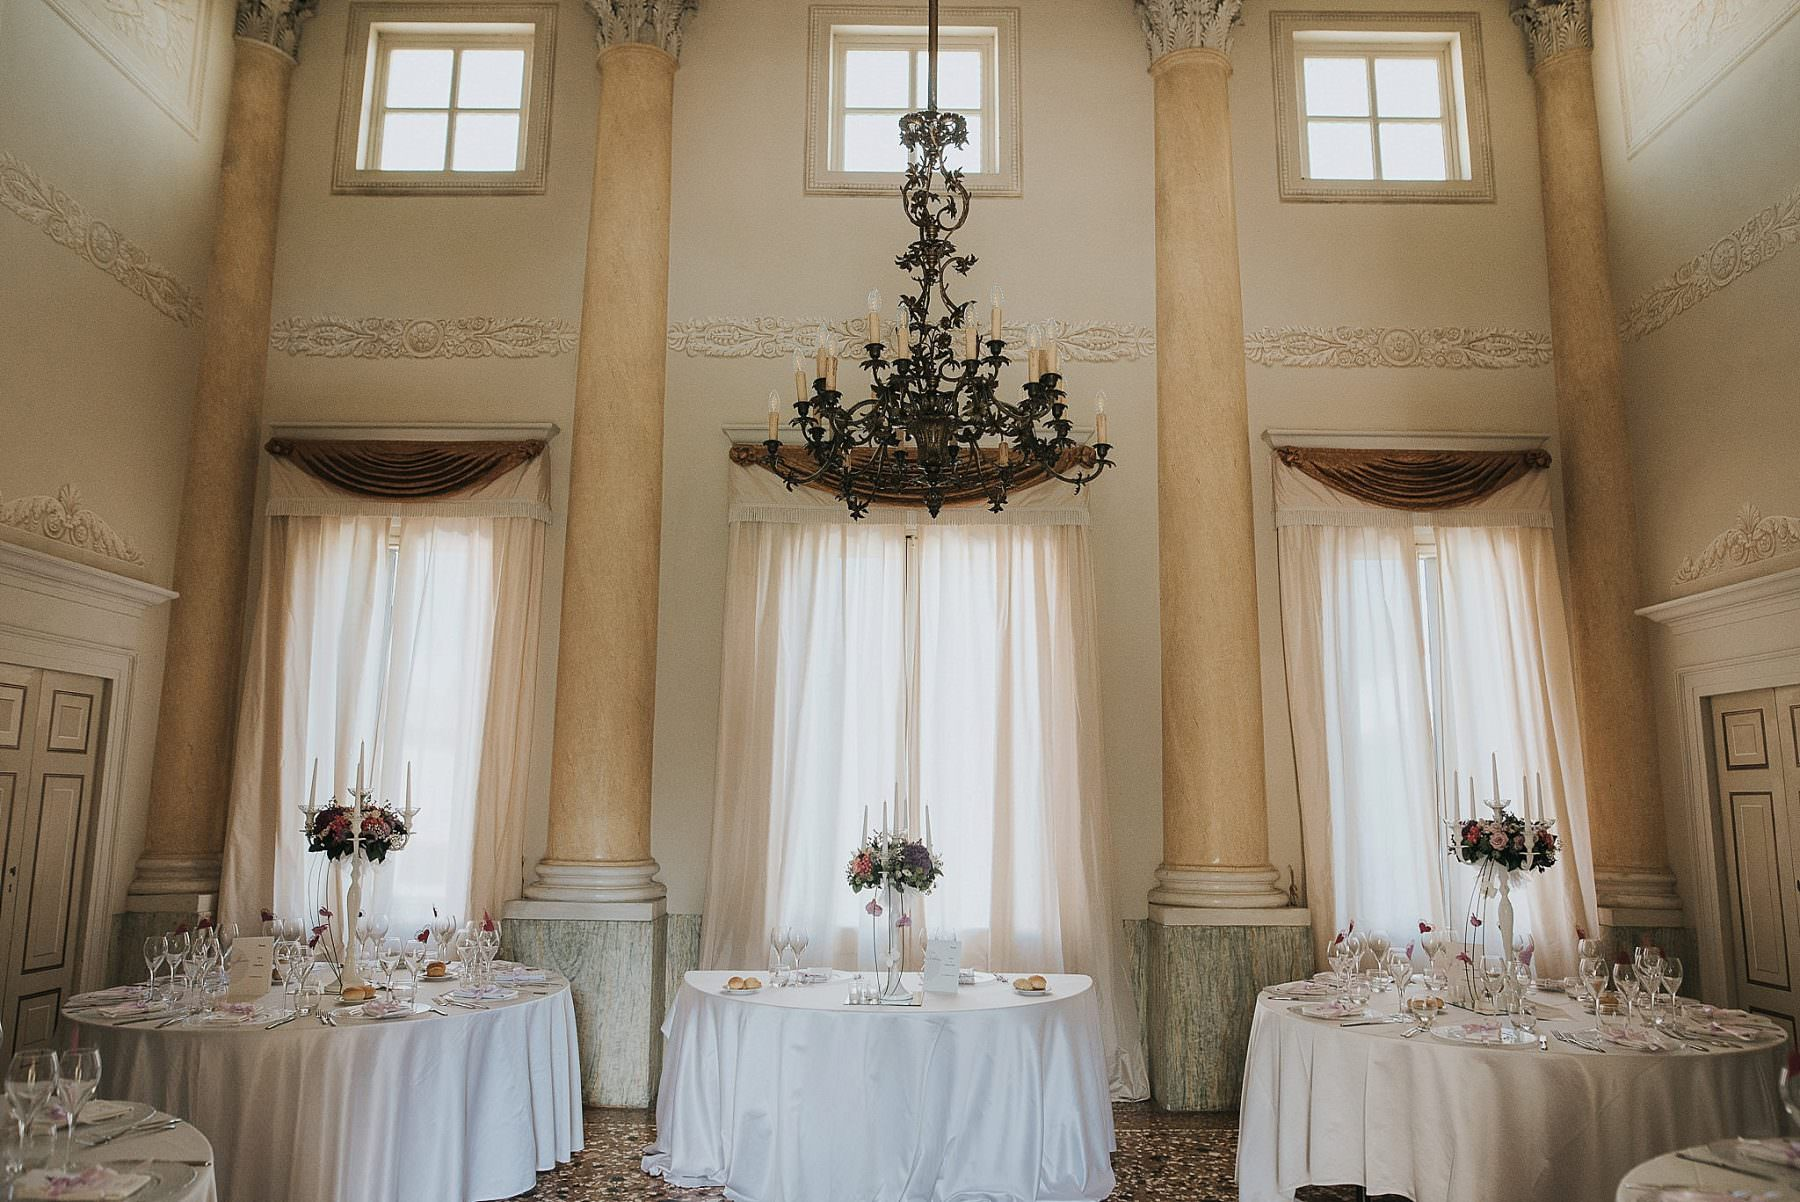 Villa di bagno u c wedding u c banqueting u c antoniazzi